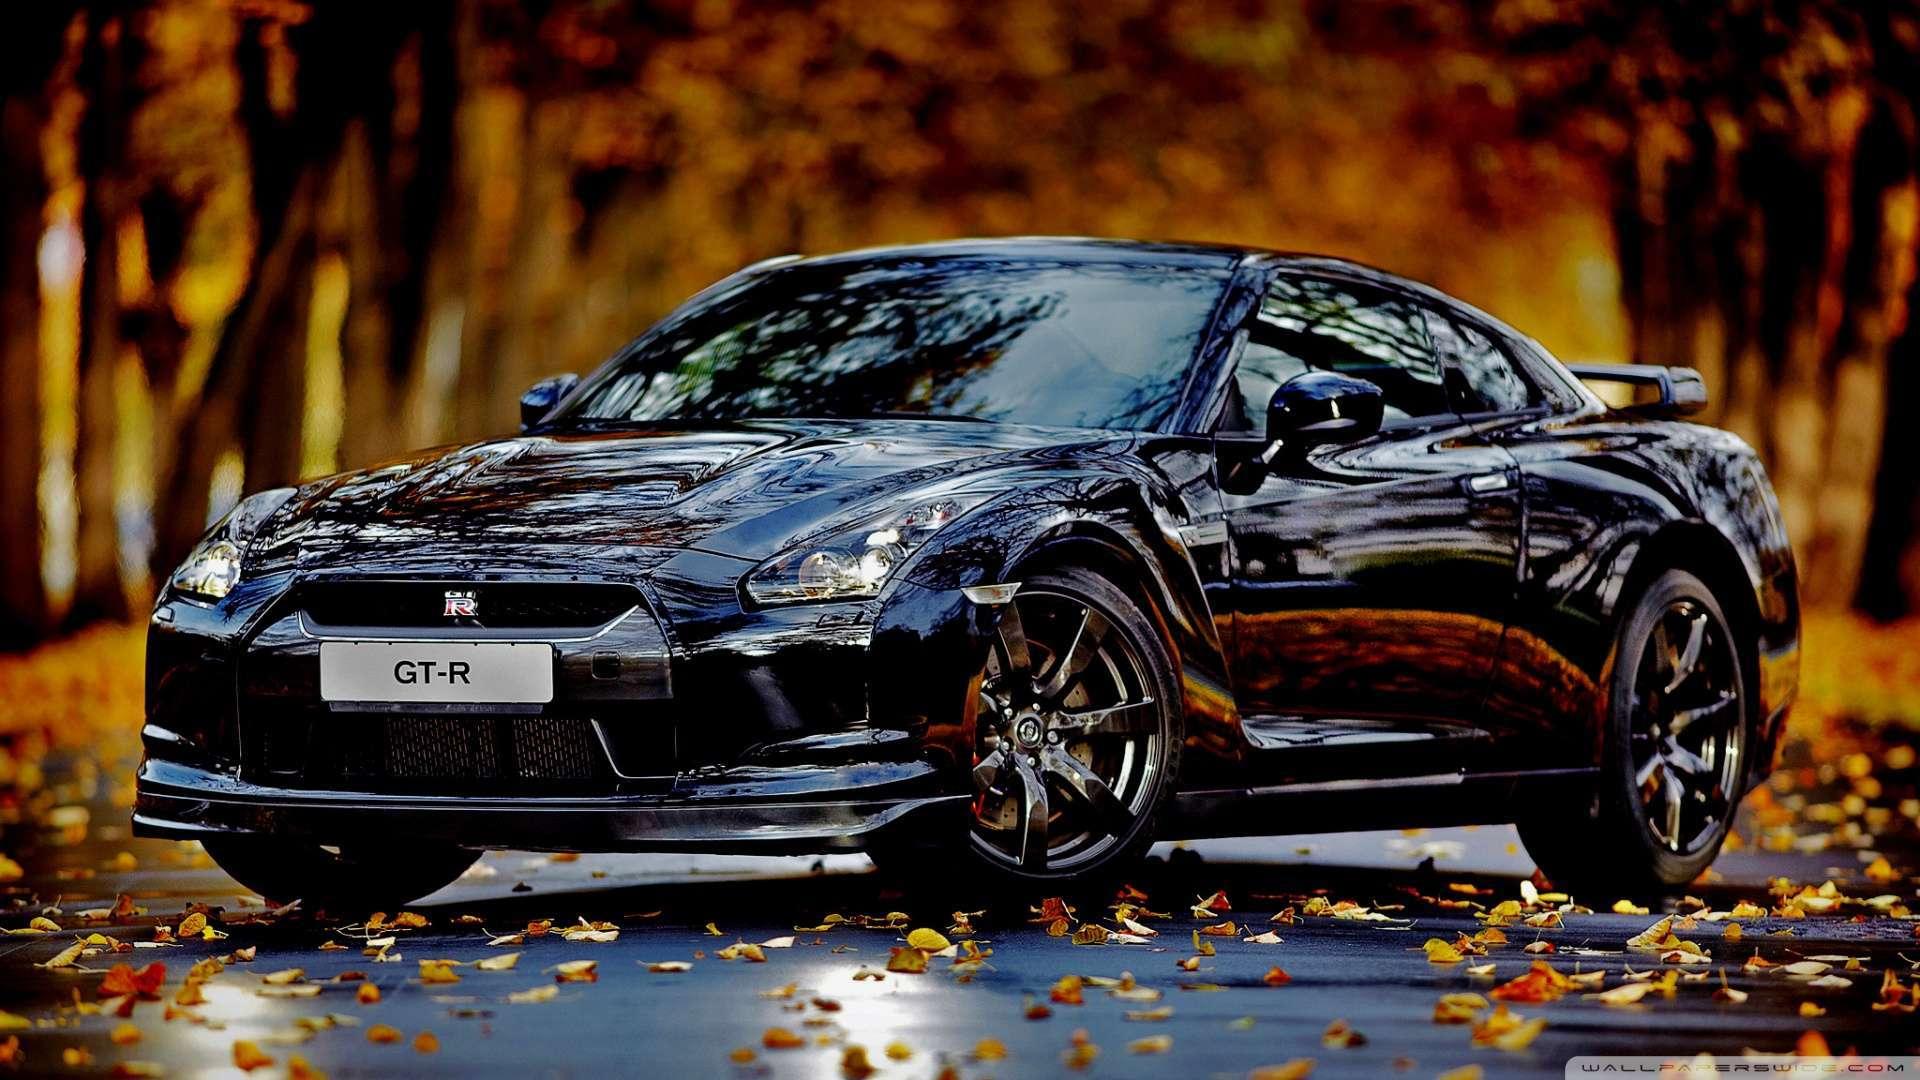 Wallpaper Nissan Skyline Gtr Autumn Wallpaper 1080p HD Upload at 1920x1080